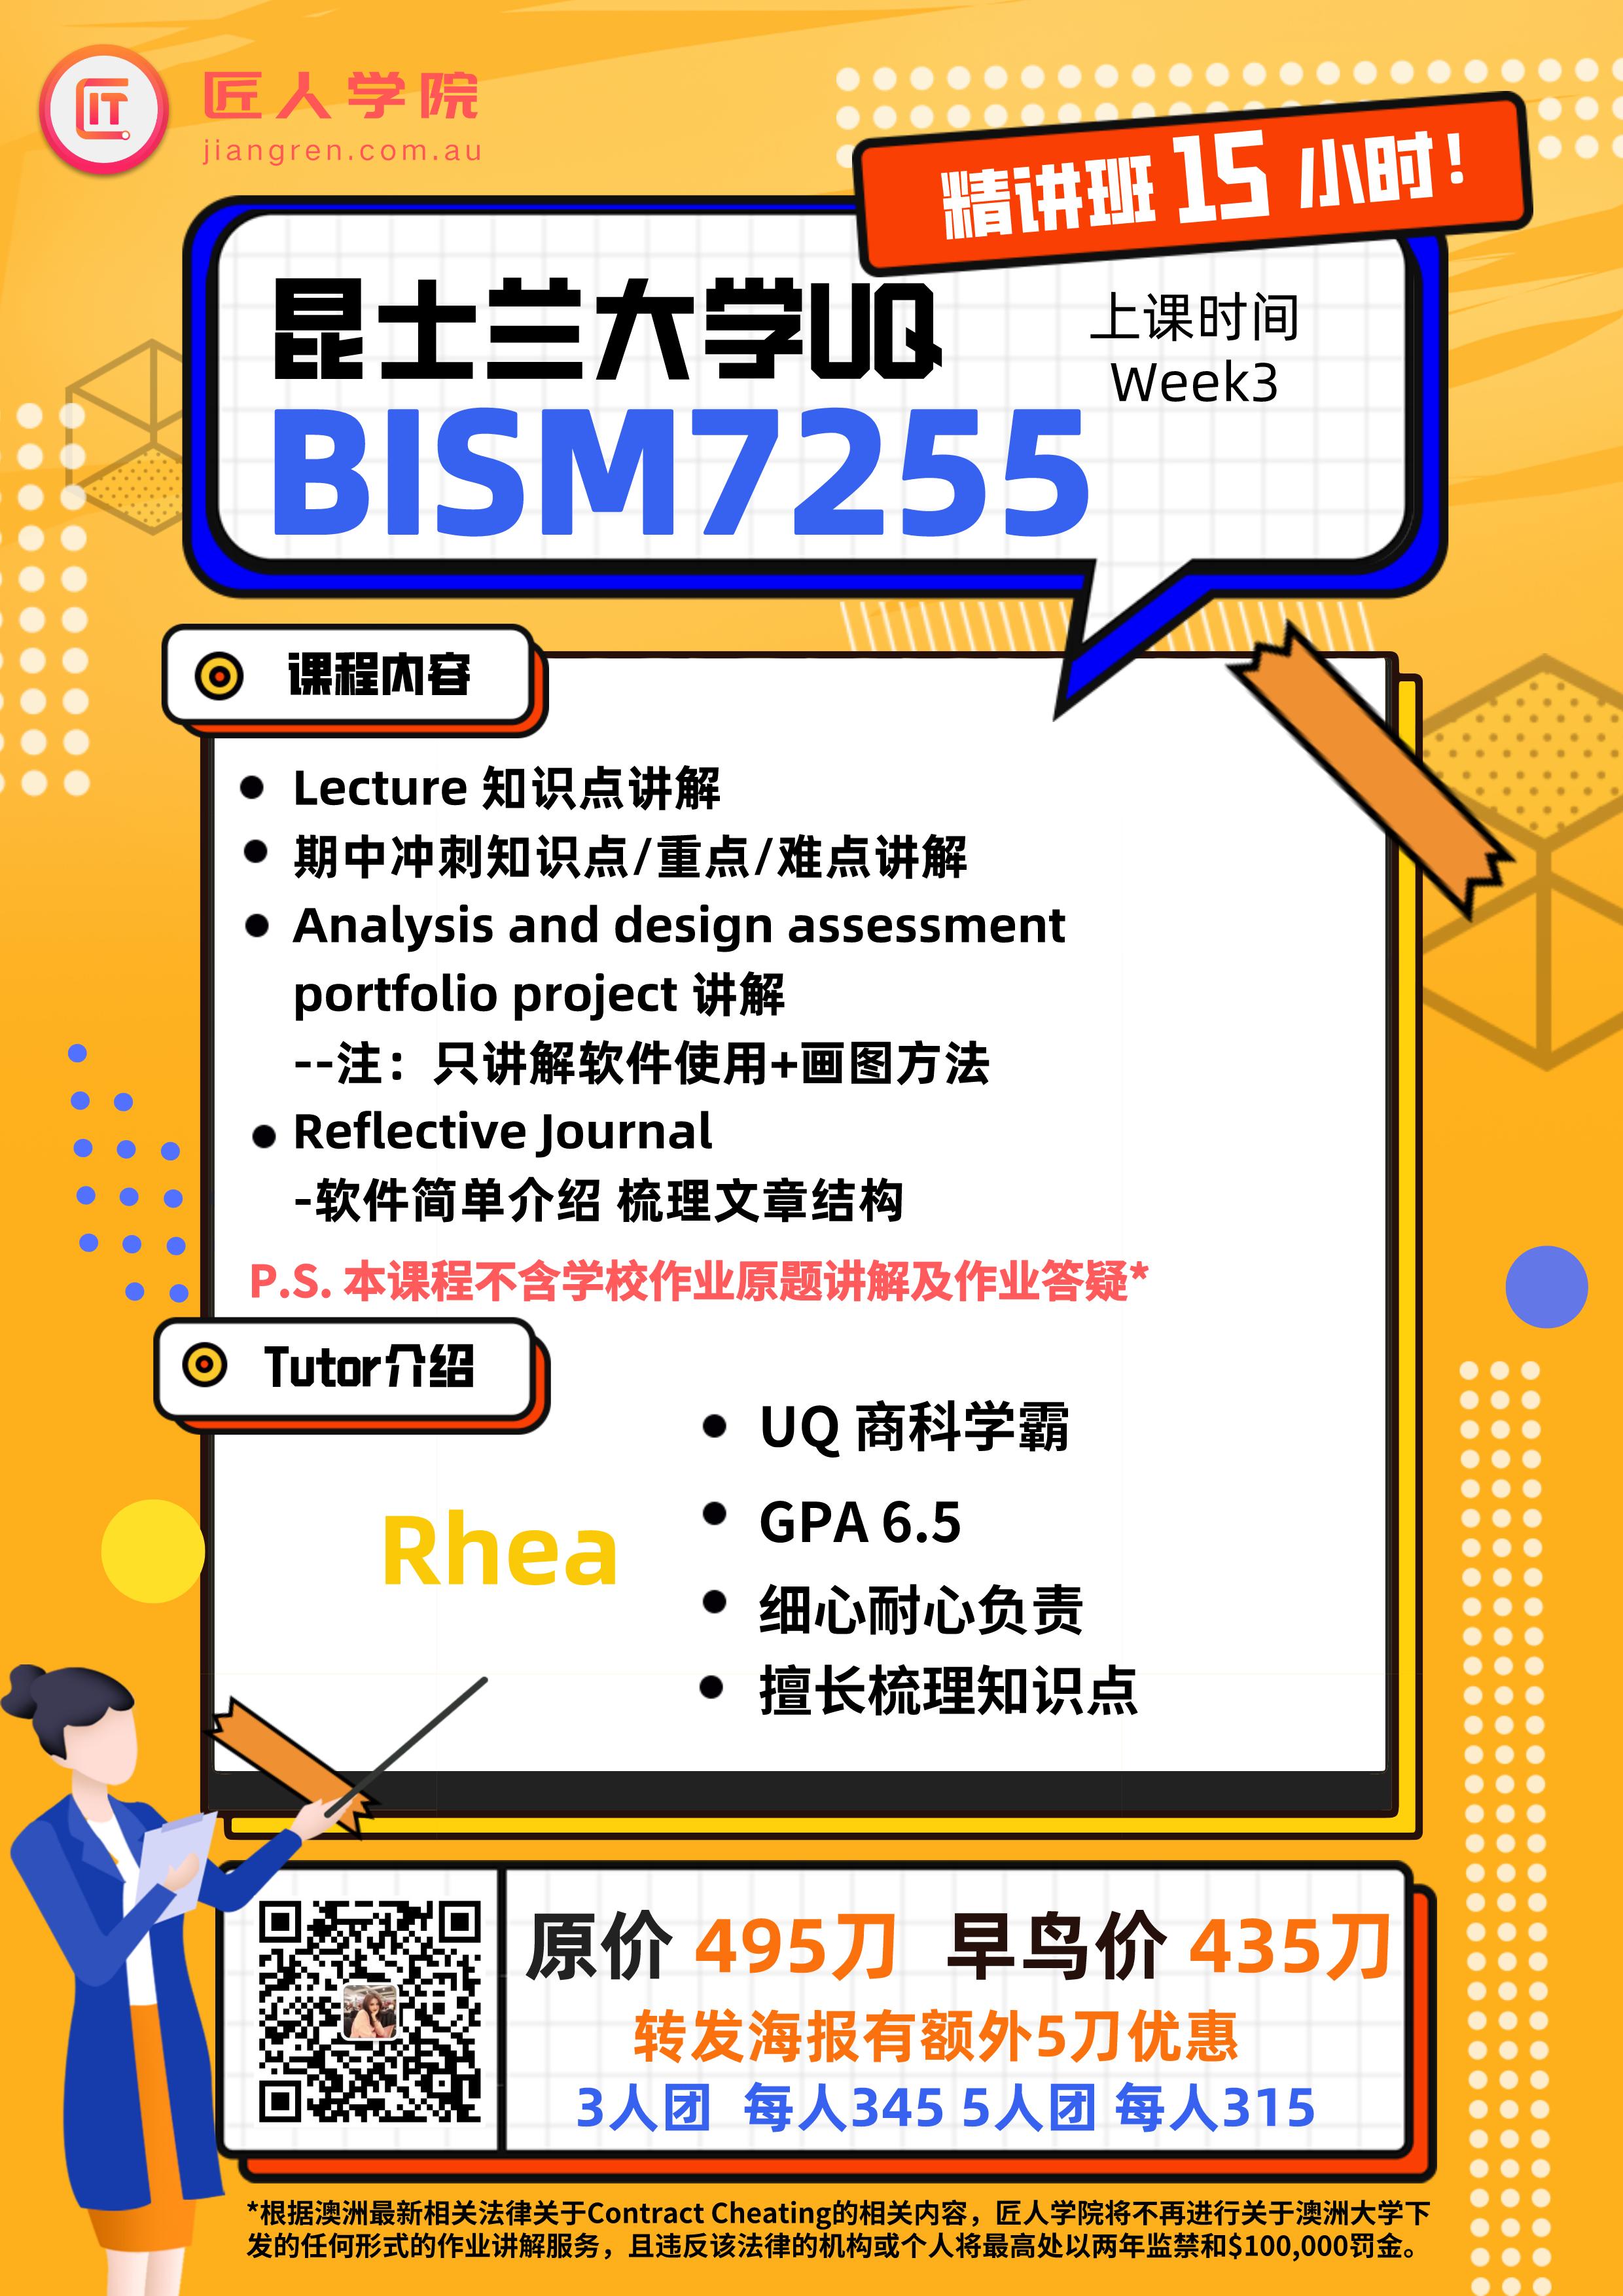 BISM7255